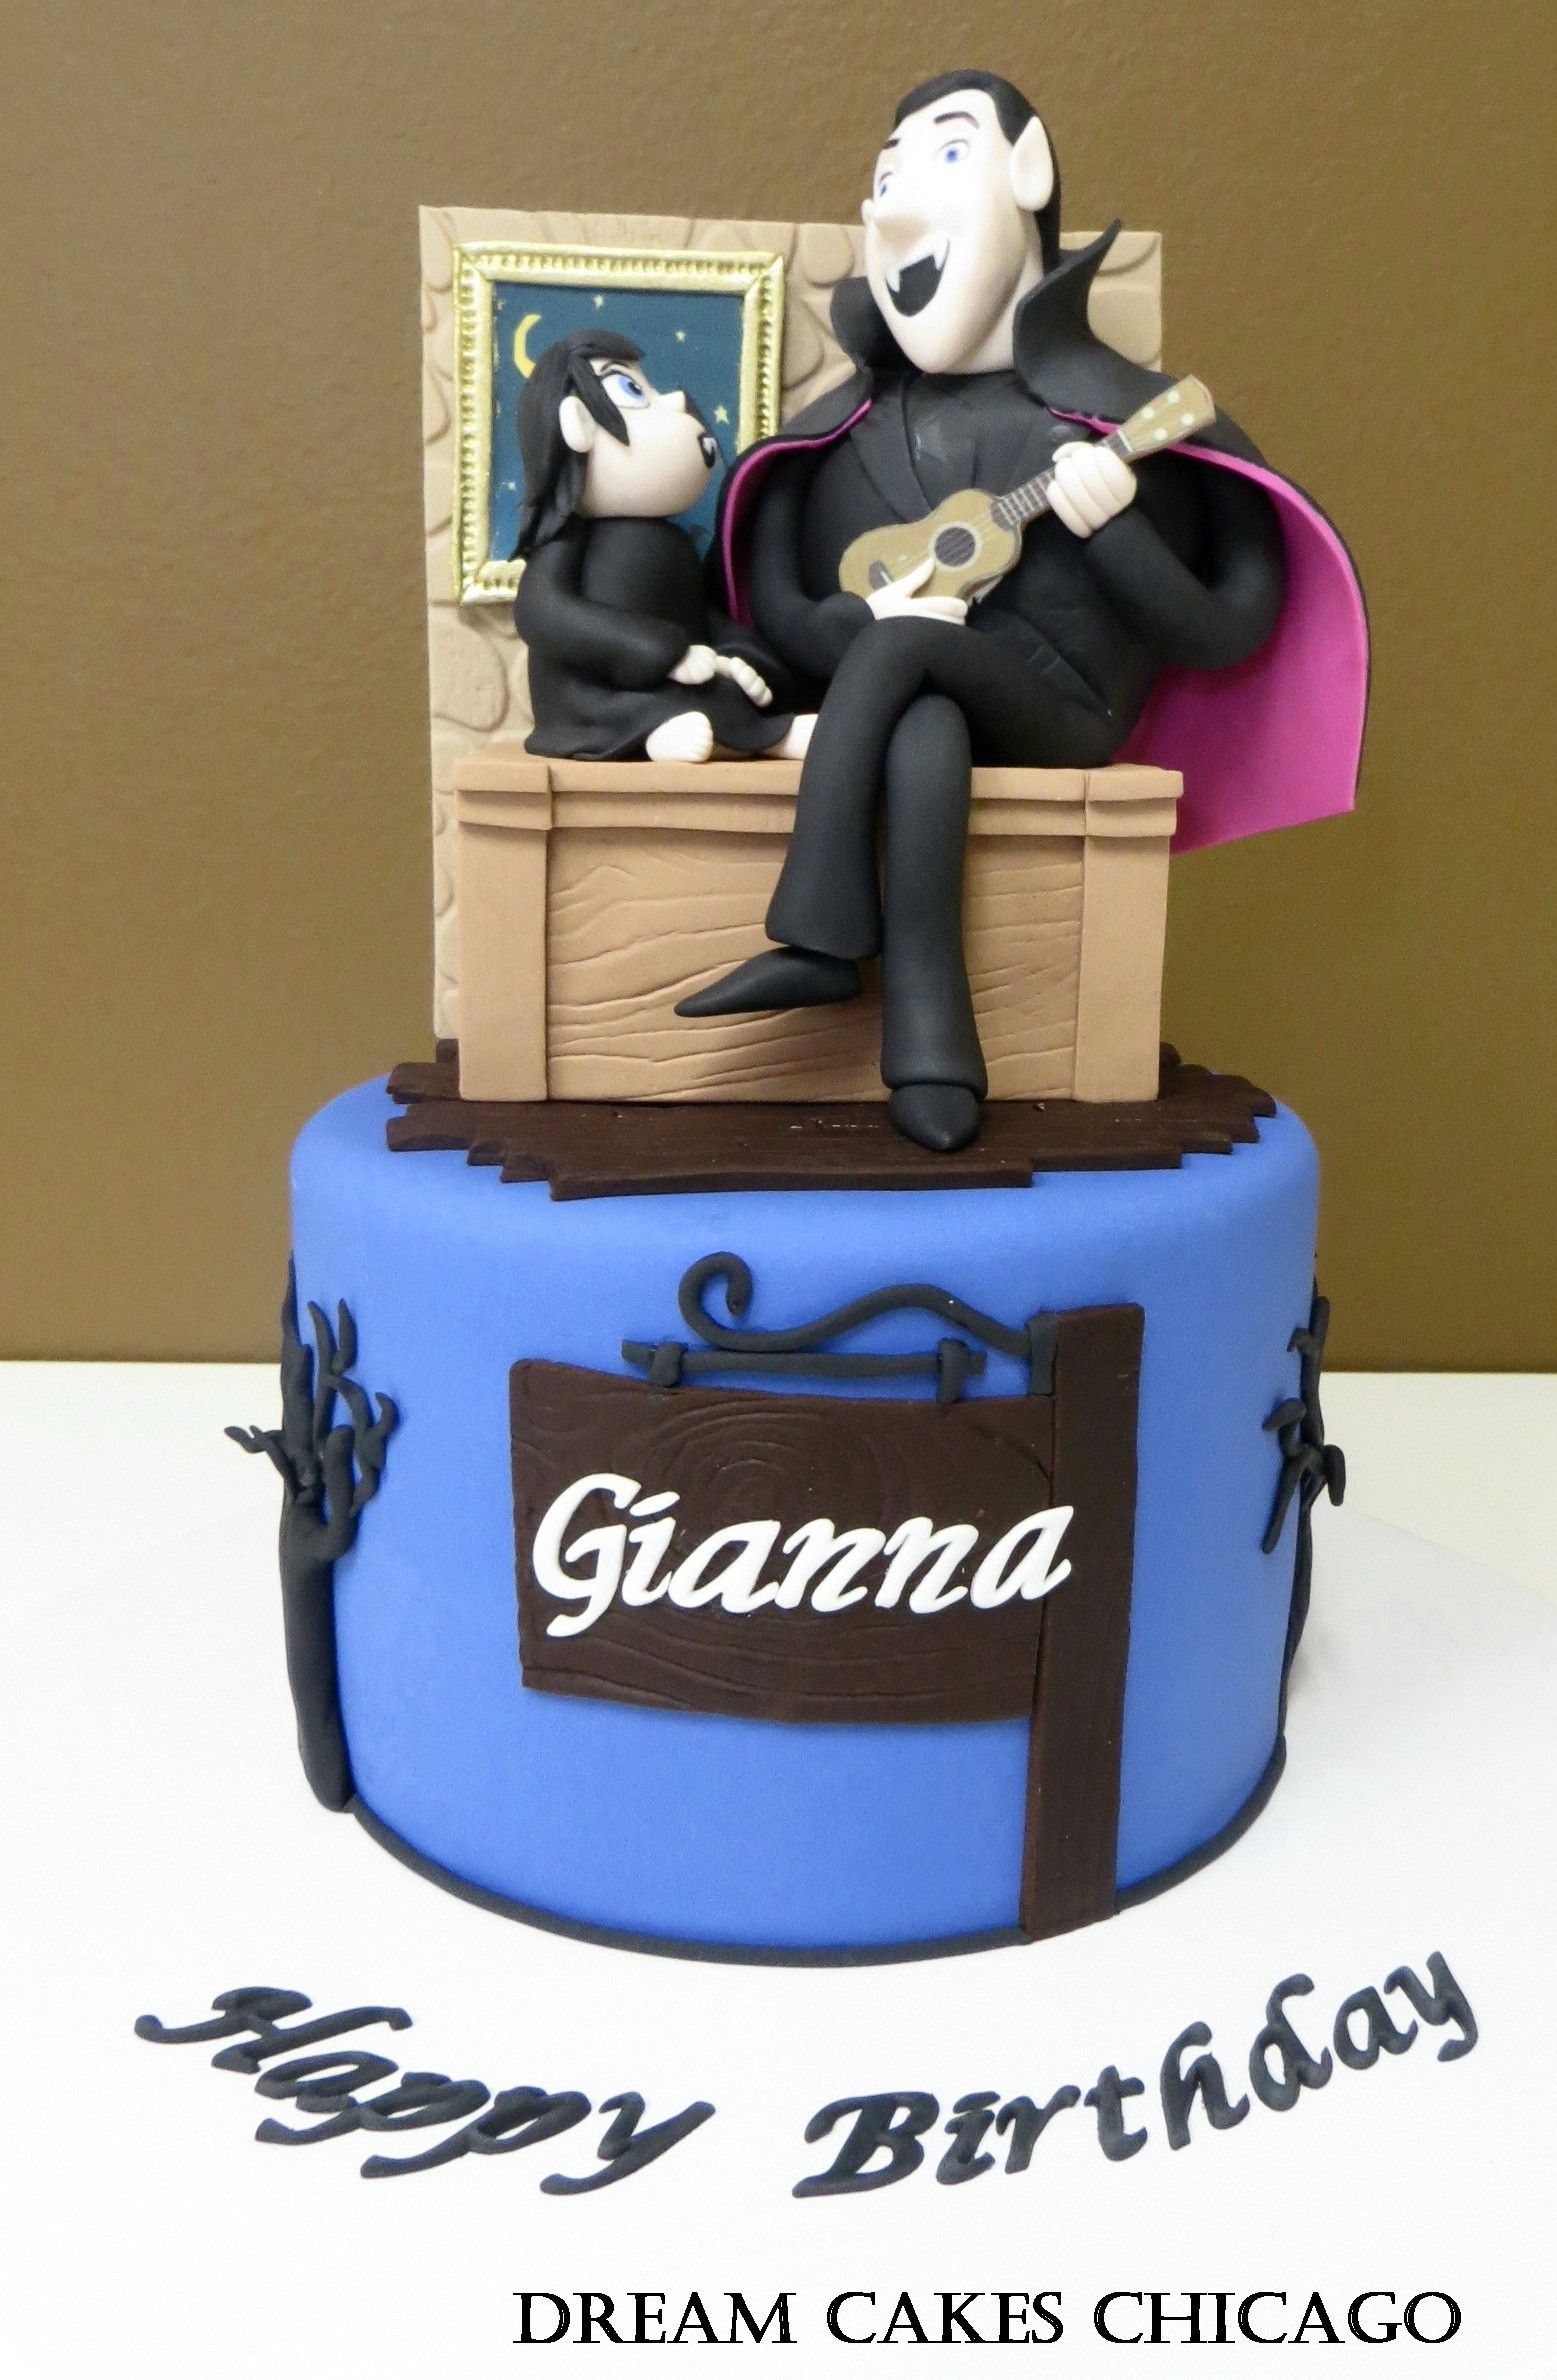 Hotel Transylvania Cake by Dream Cakes Chicago | Birthday Cakes ...